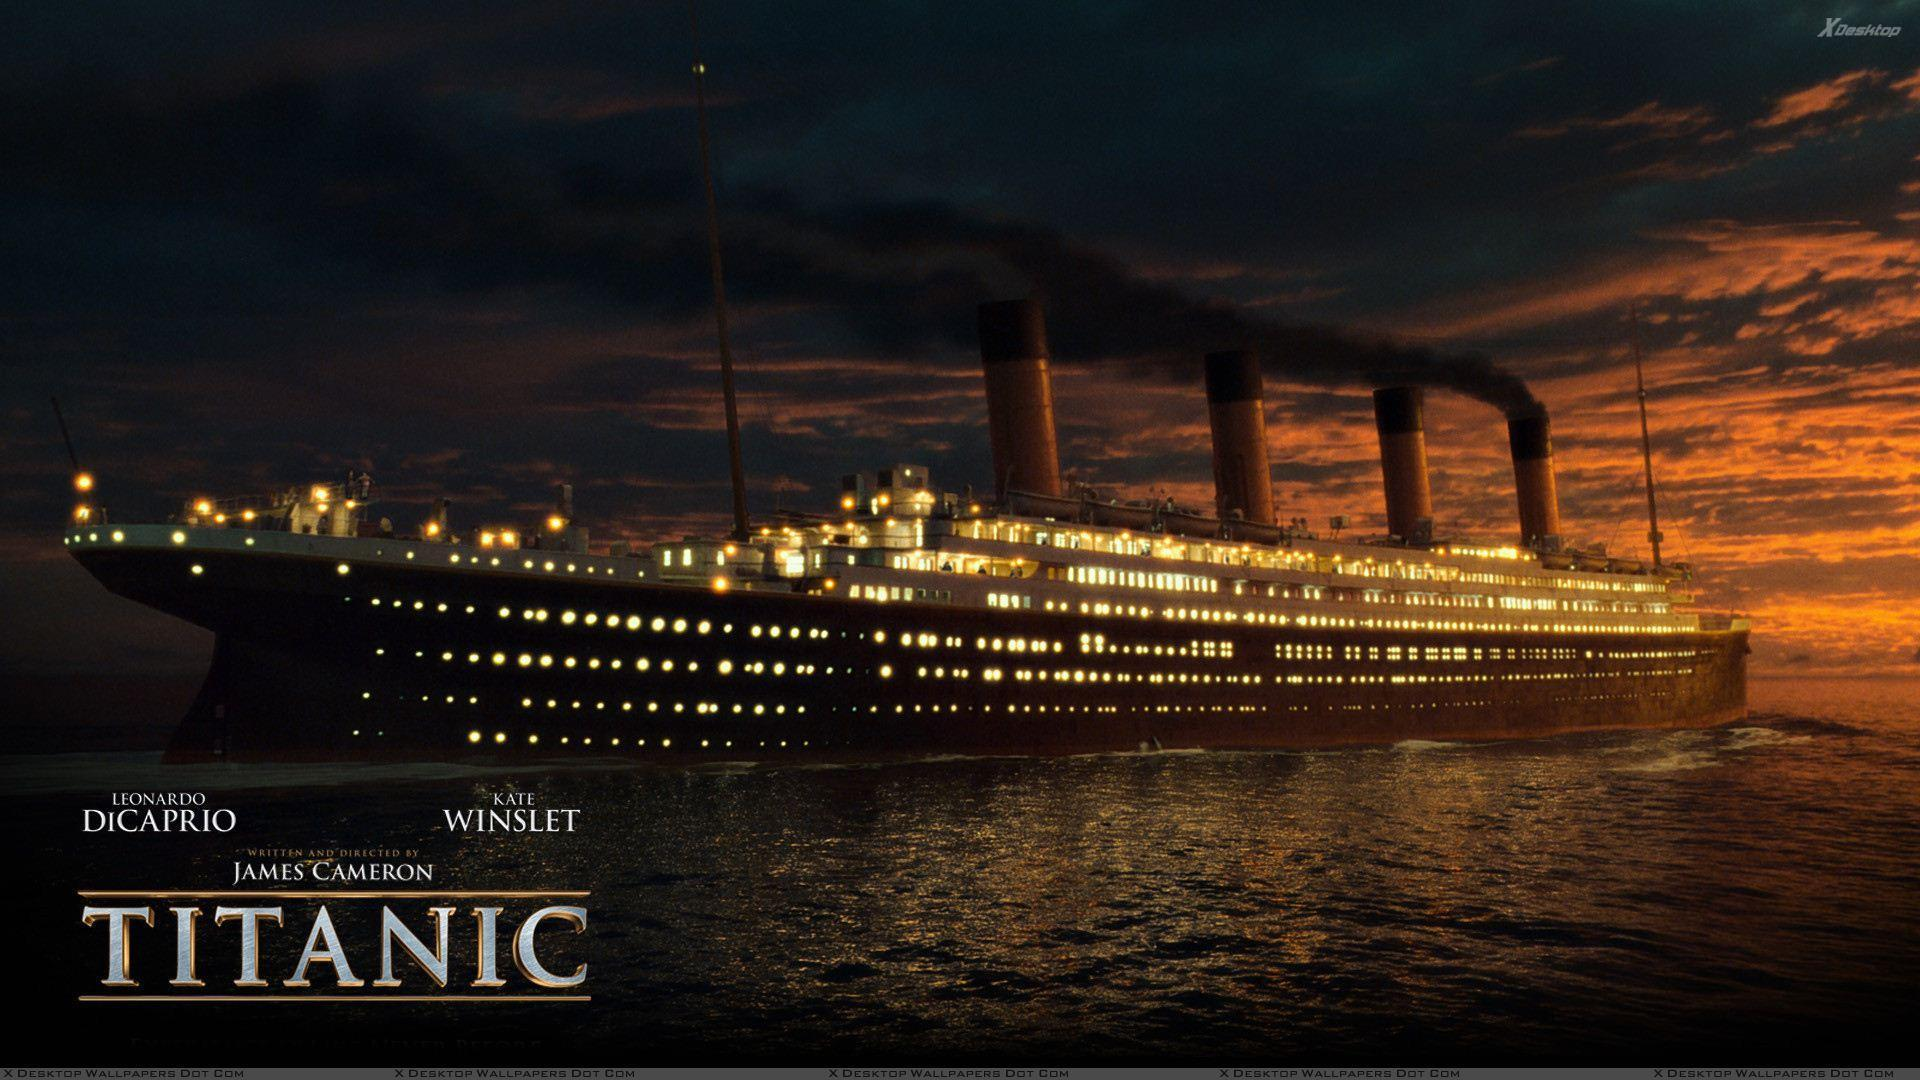 Titanic Ship Wallpapers - Wallpaper Cave